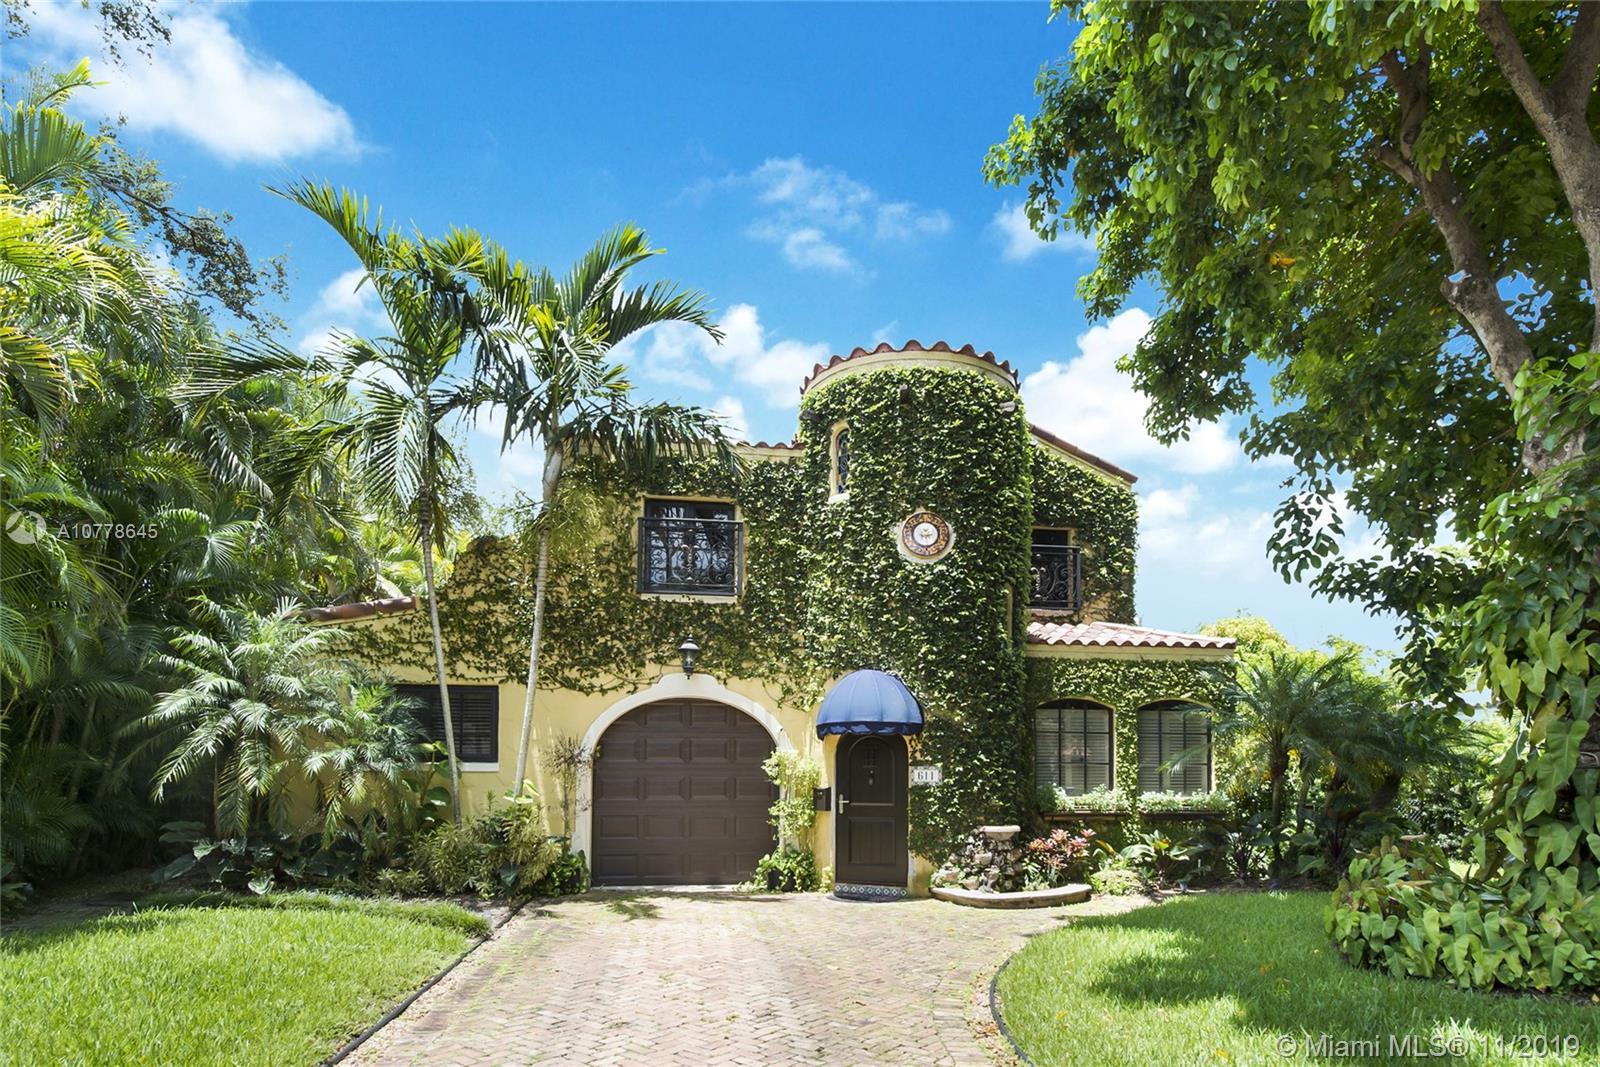 611  San Antonio Ave.  For Sale A10778645, FL